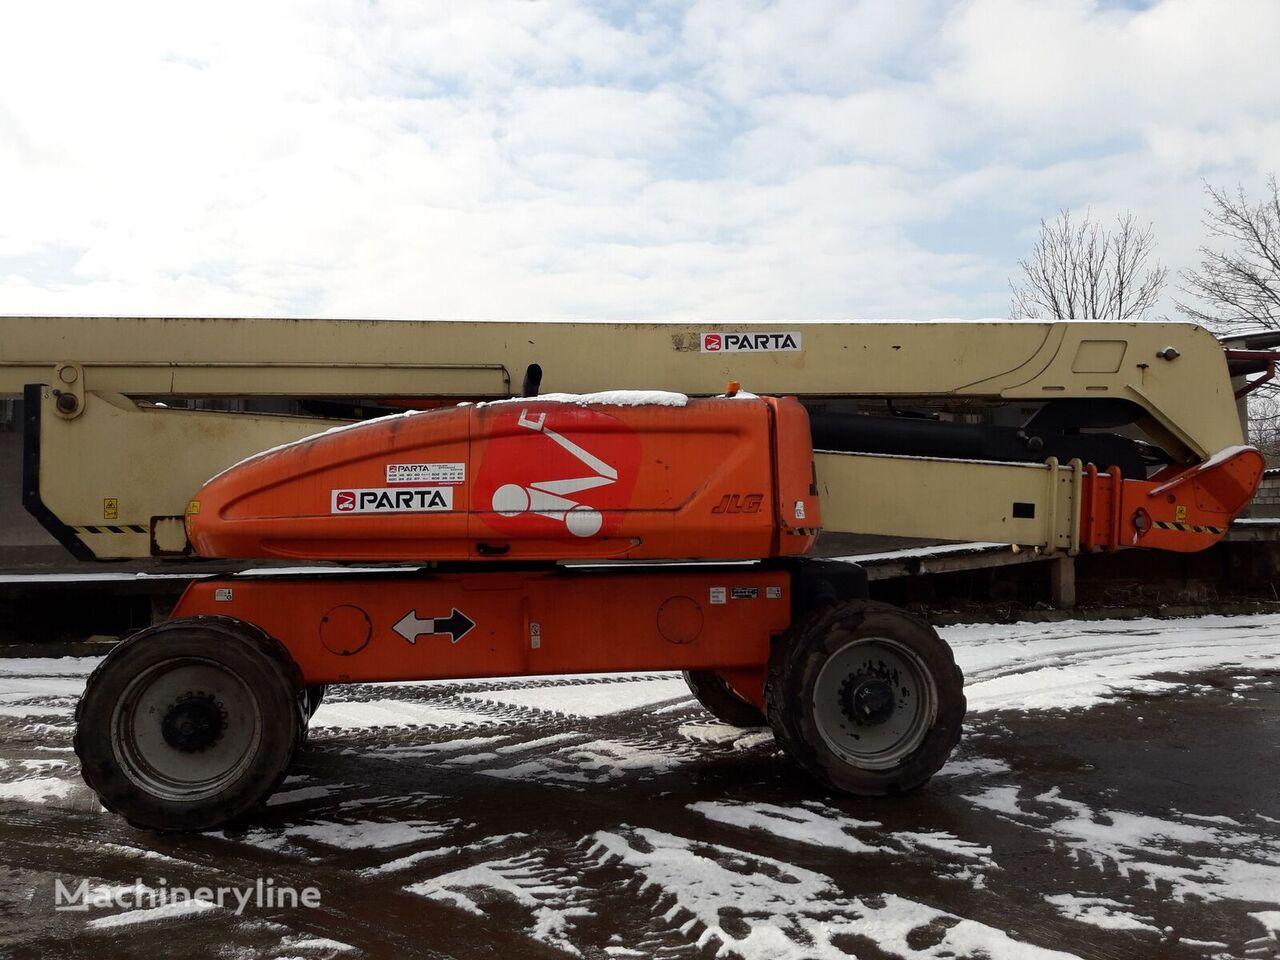 JLG 1250 AJ articulated boom lift